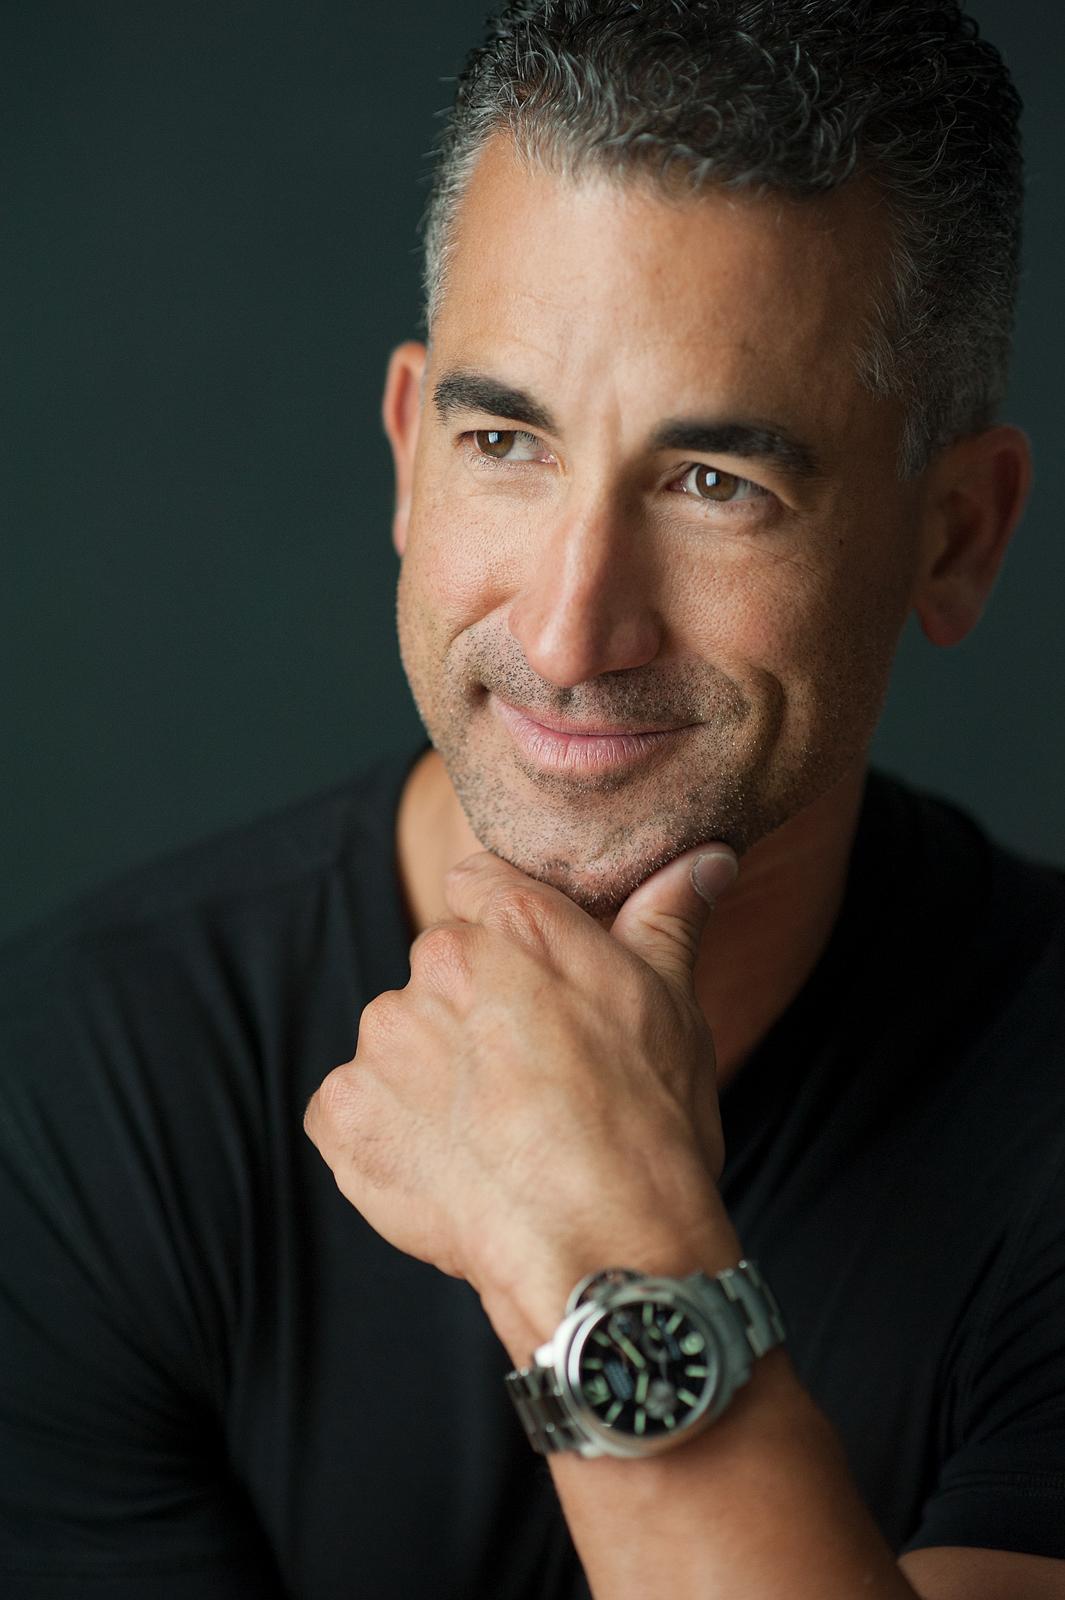 11-great-man-headshot-watch-stubble-pose-handsome-megan-dipiero-photography-naples.jpg